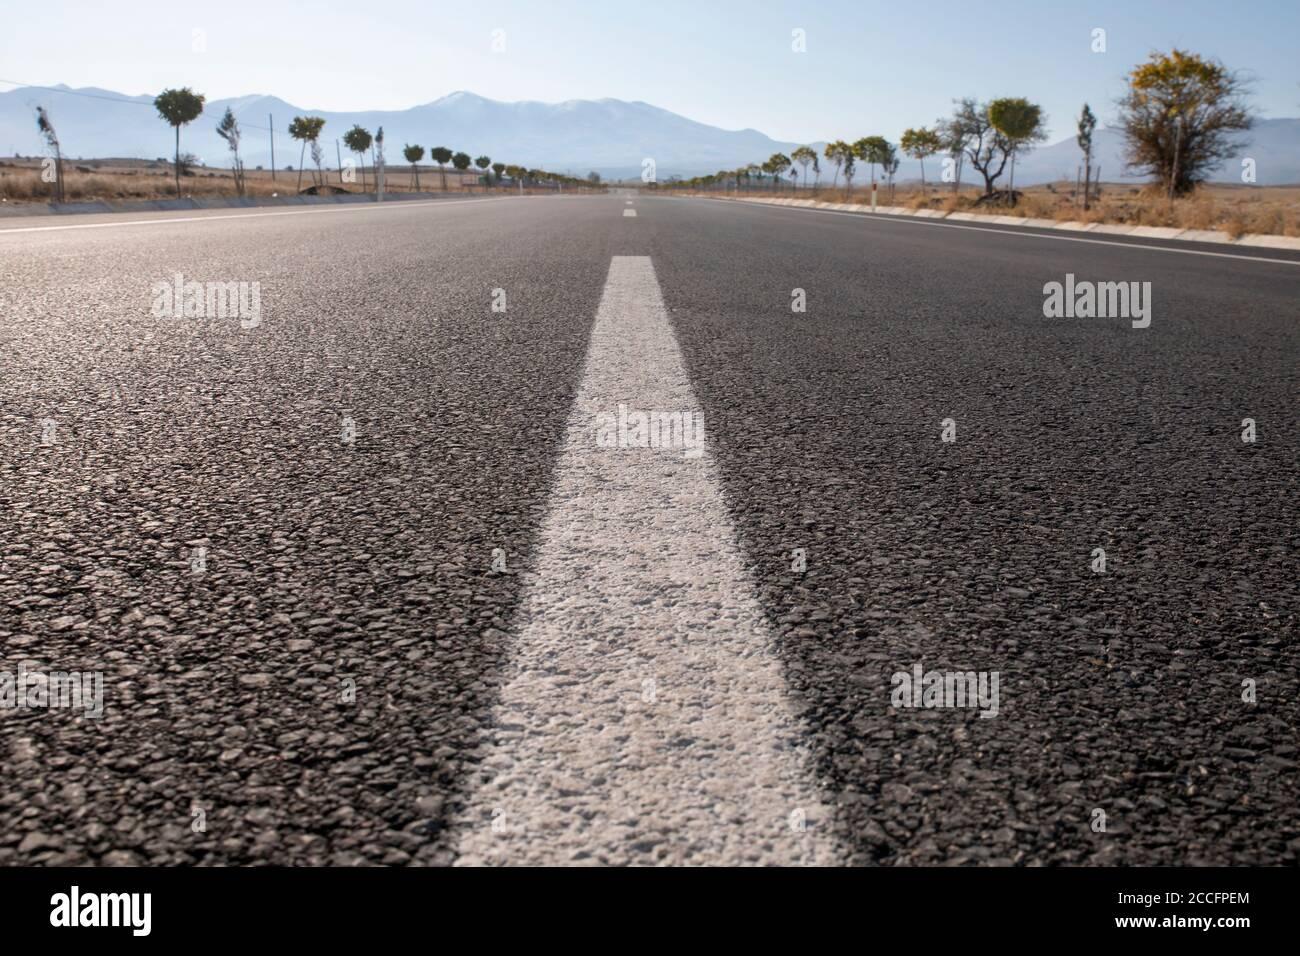 Asphalt Road background, Travel Concept Stock Photo